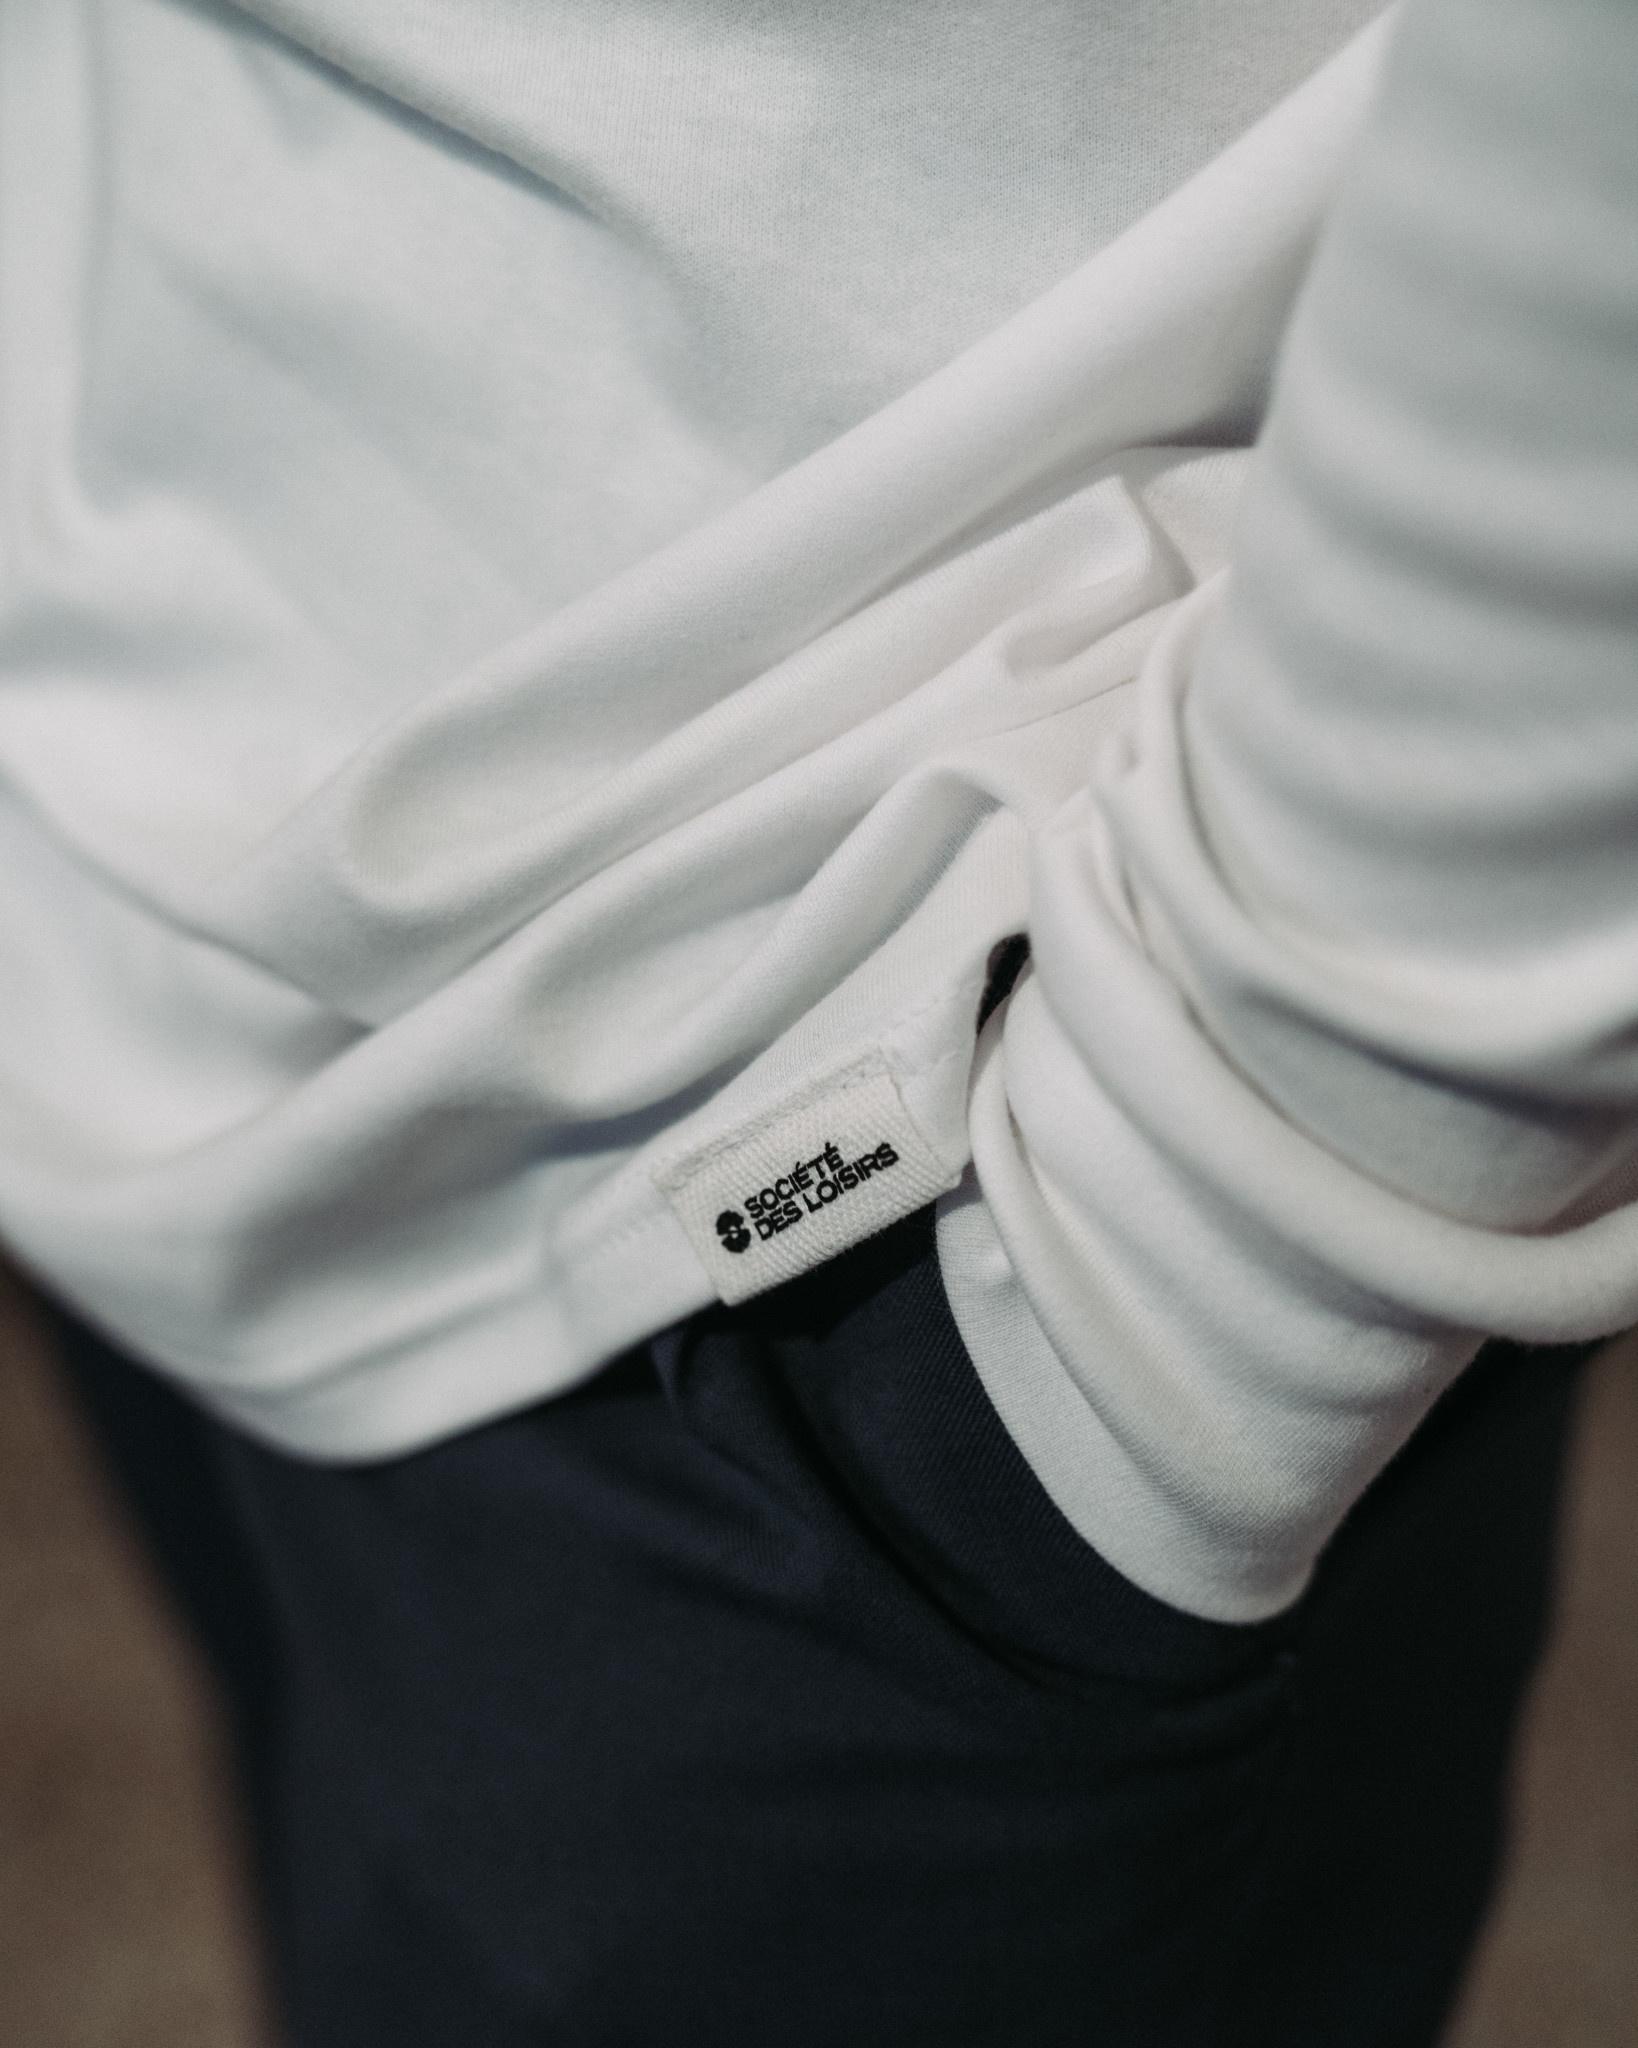 Chandail [blanc] à manche longue-2